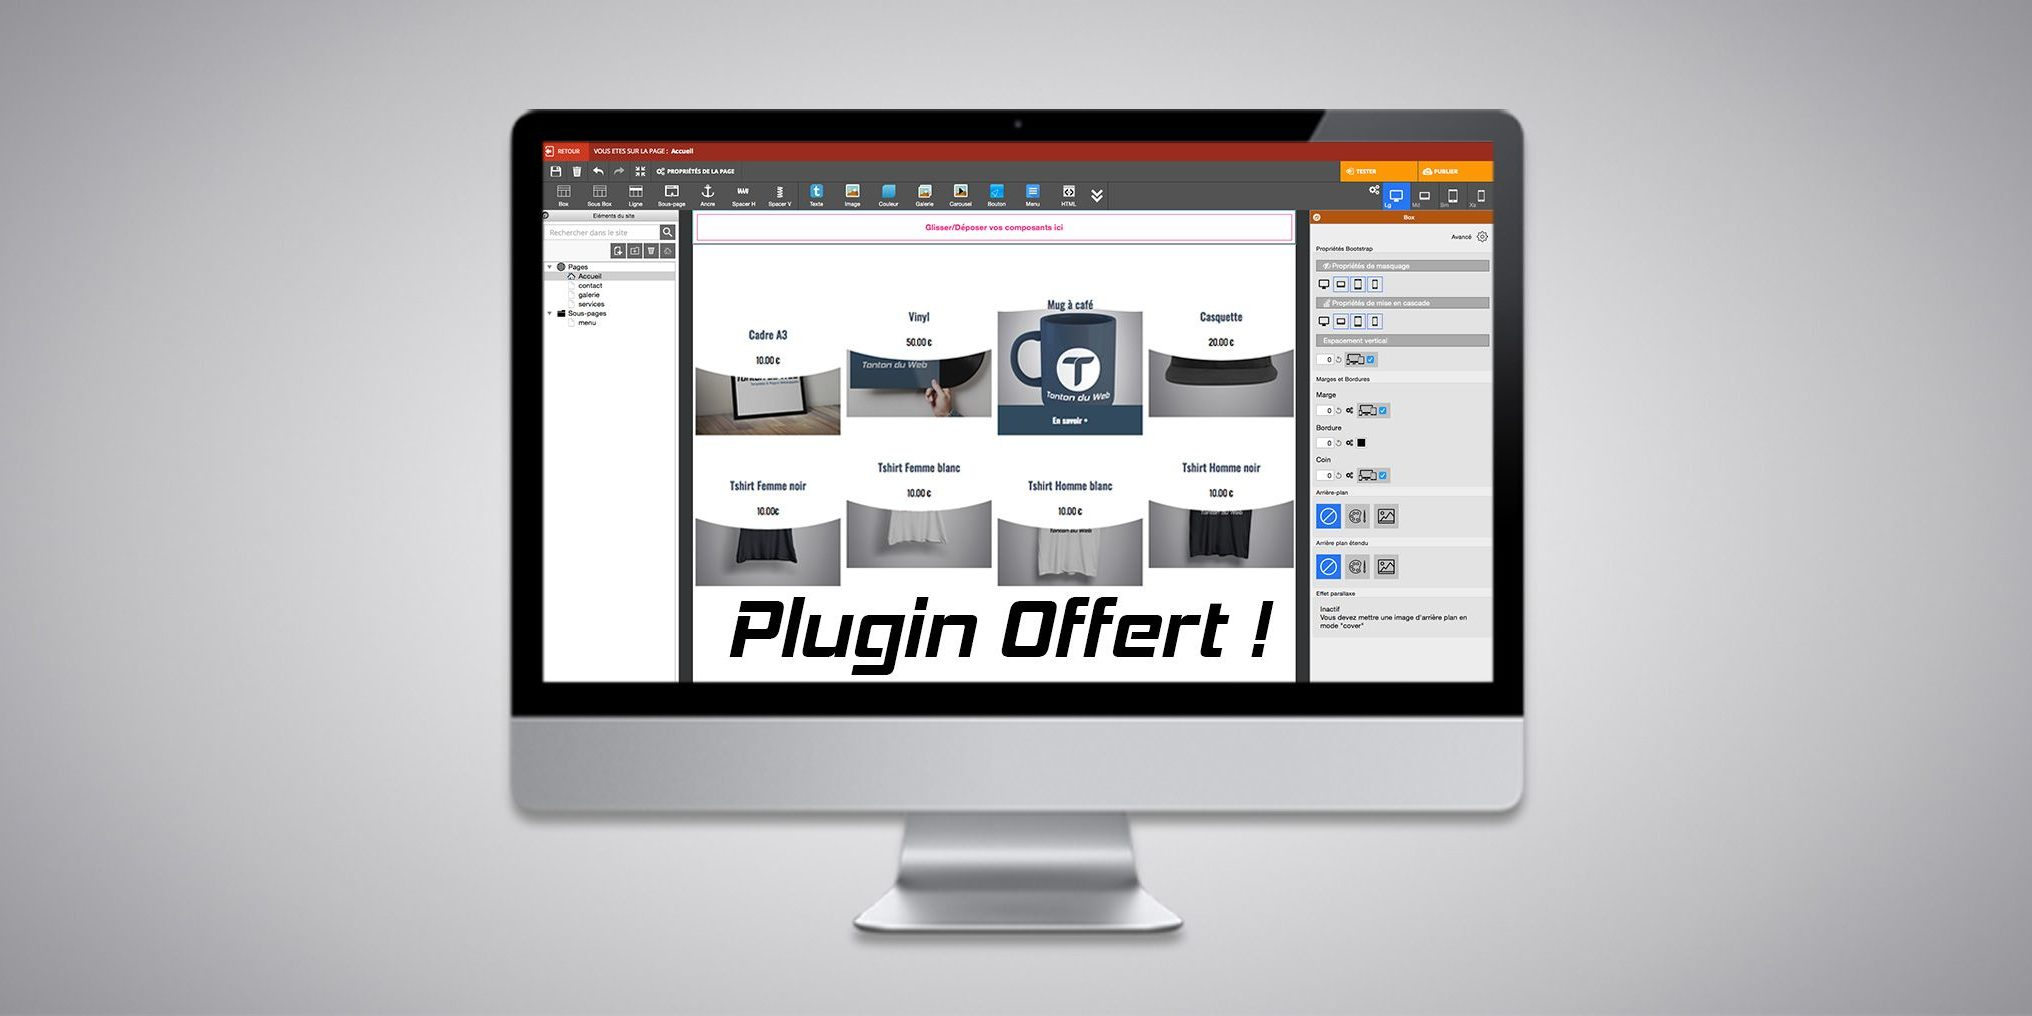 Mise en avant des produits WA Market : plugin offert !